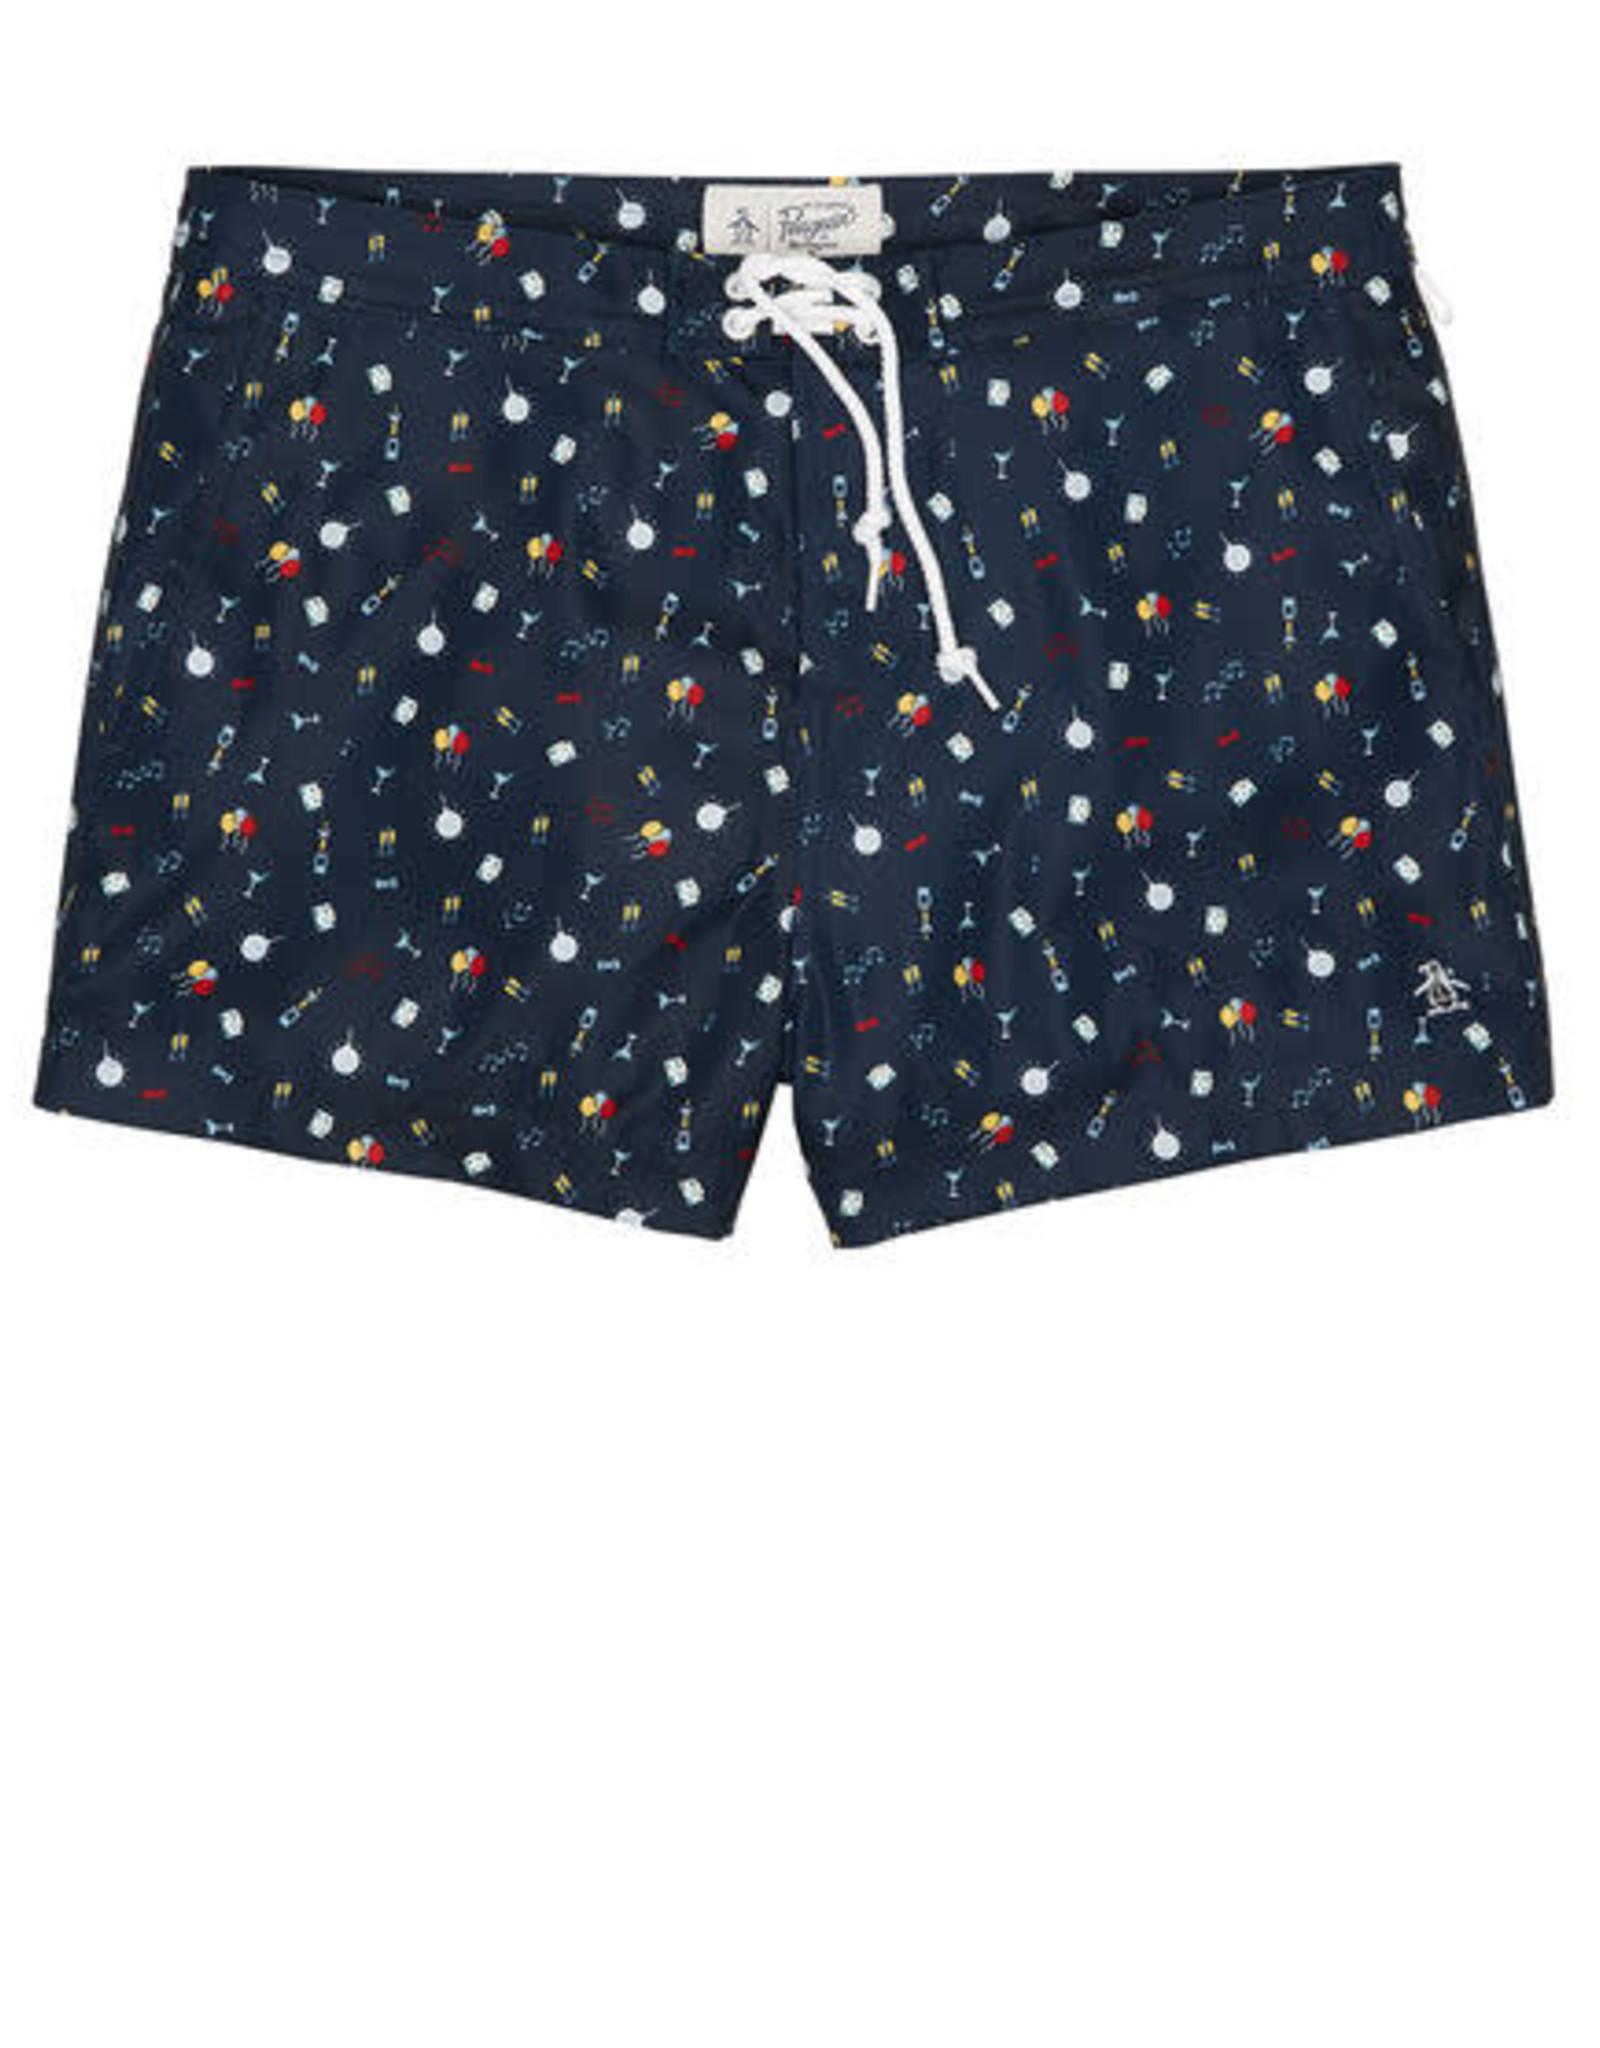 Penguin Penguin Party Print Box Fit Swim Shorts